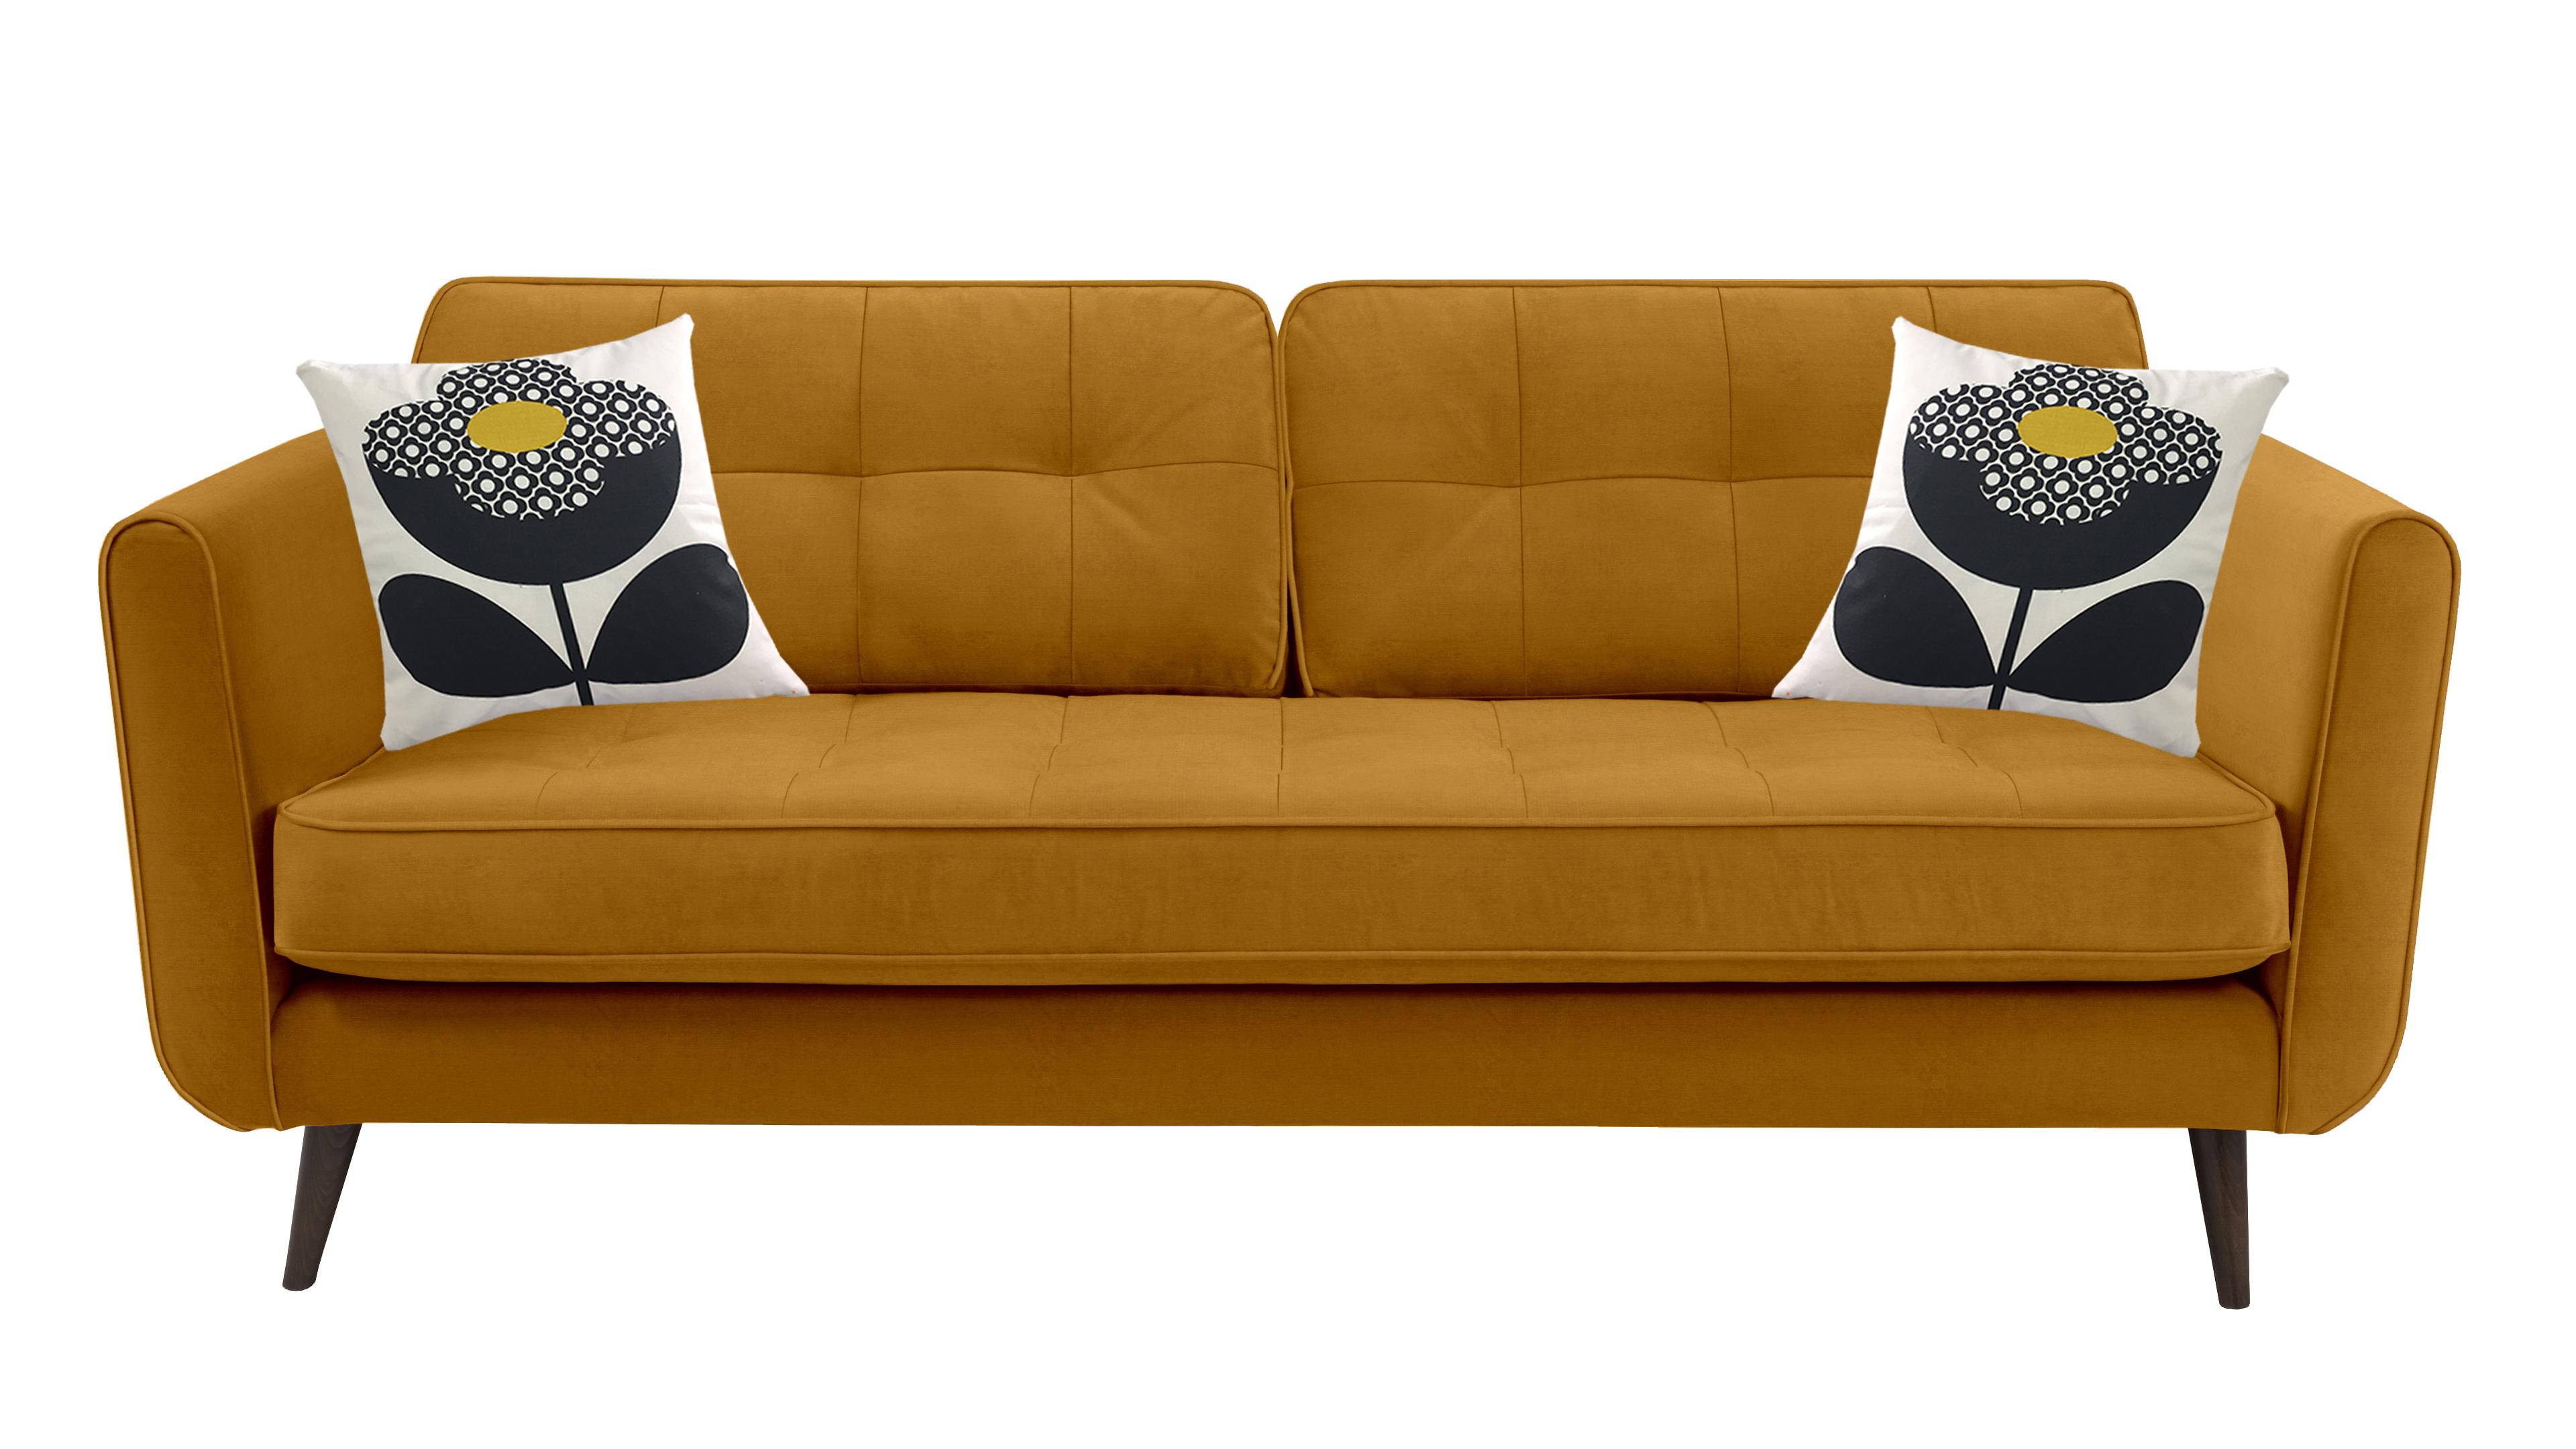 Ivy large Sofa Glyde